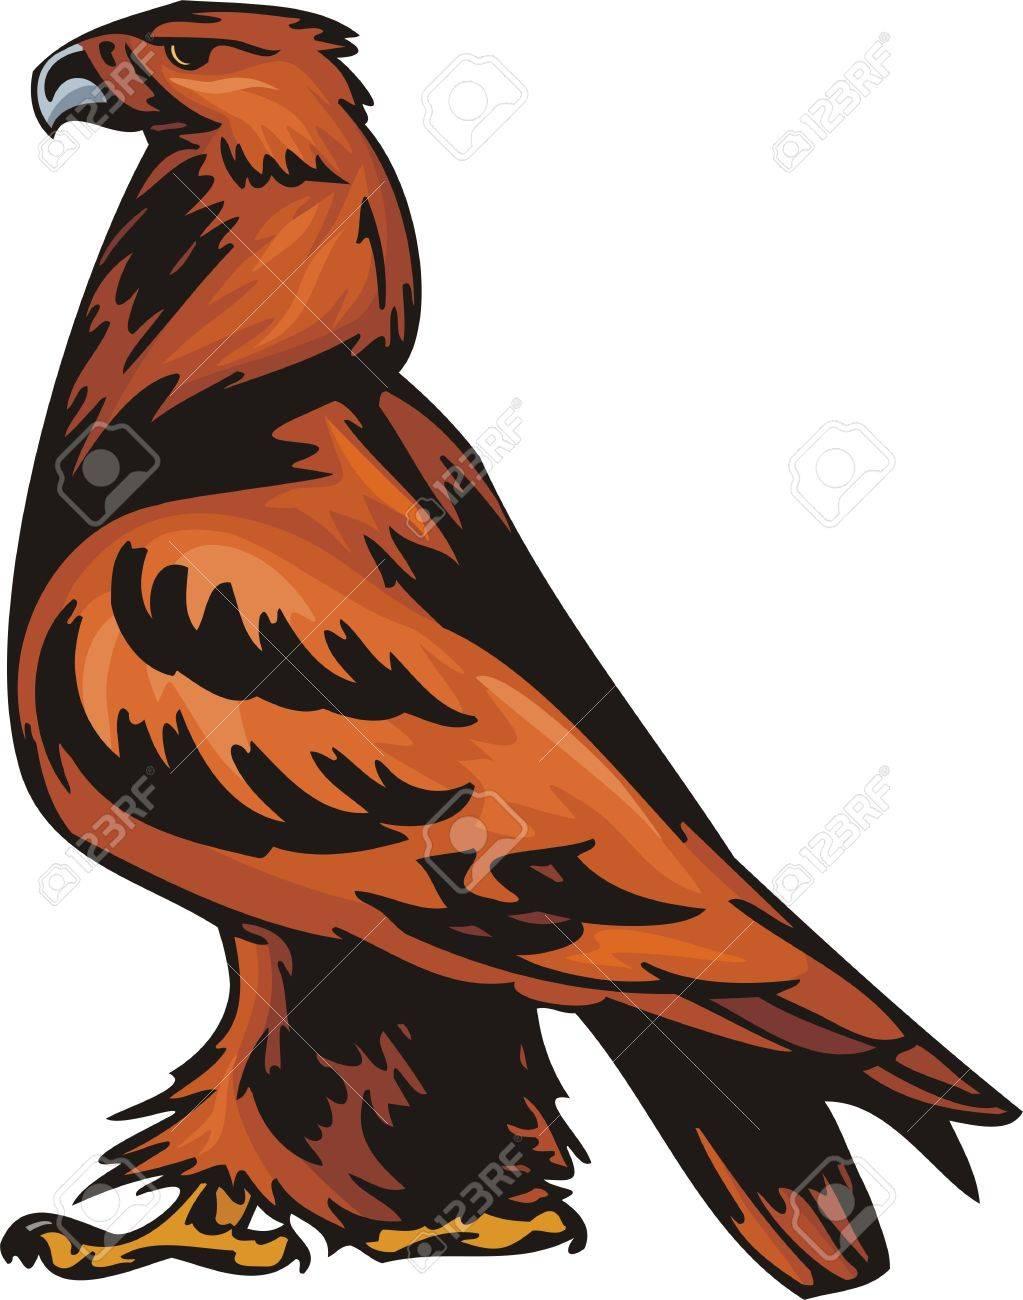 the big eagle with orange plumage predatory birds illustration